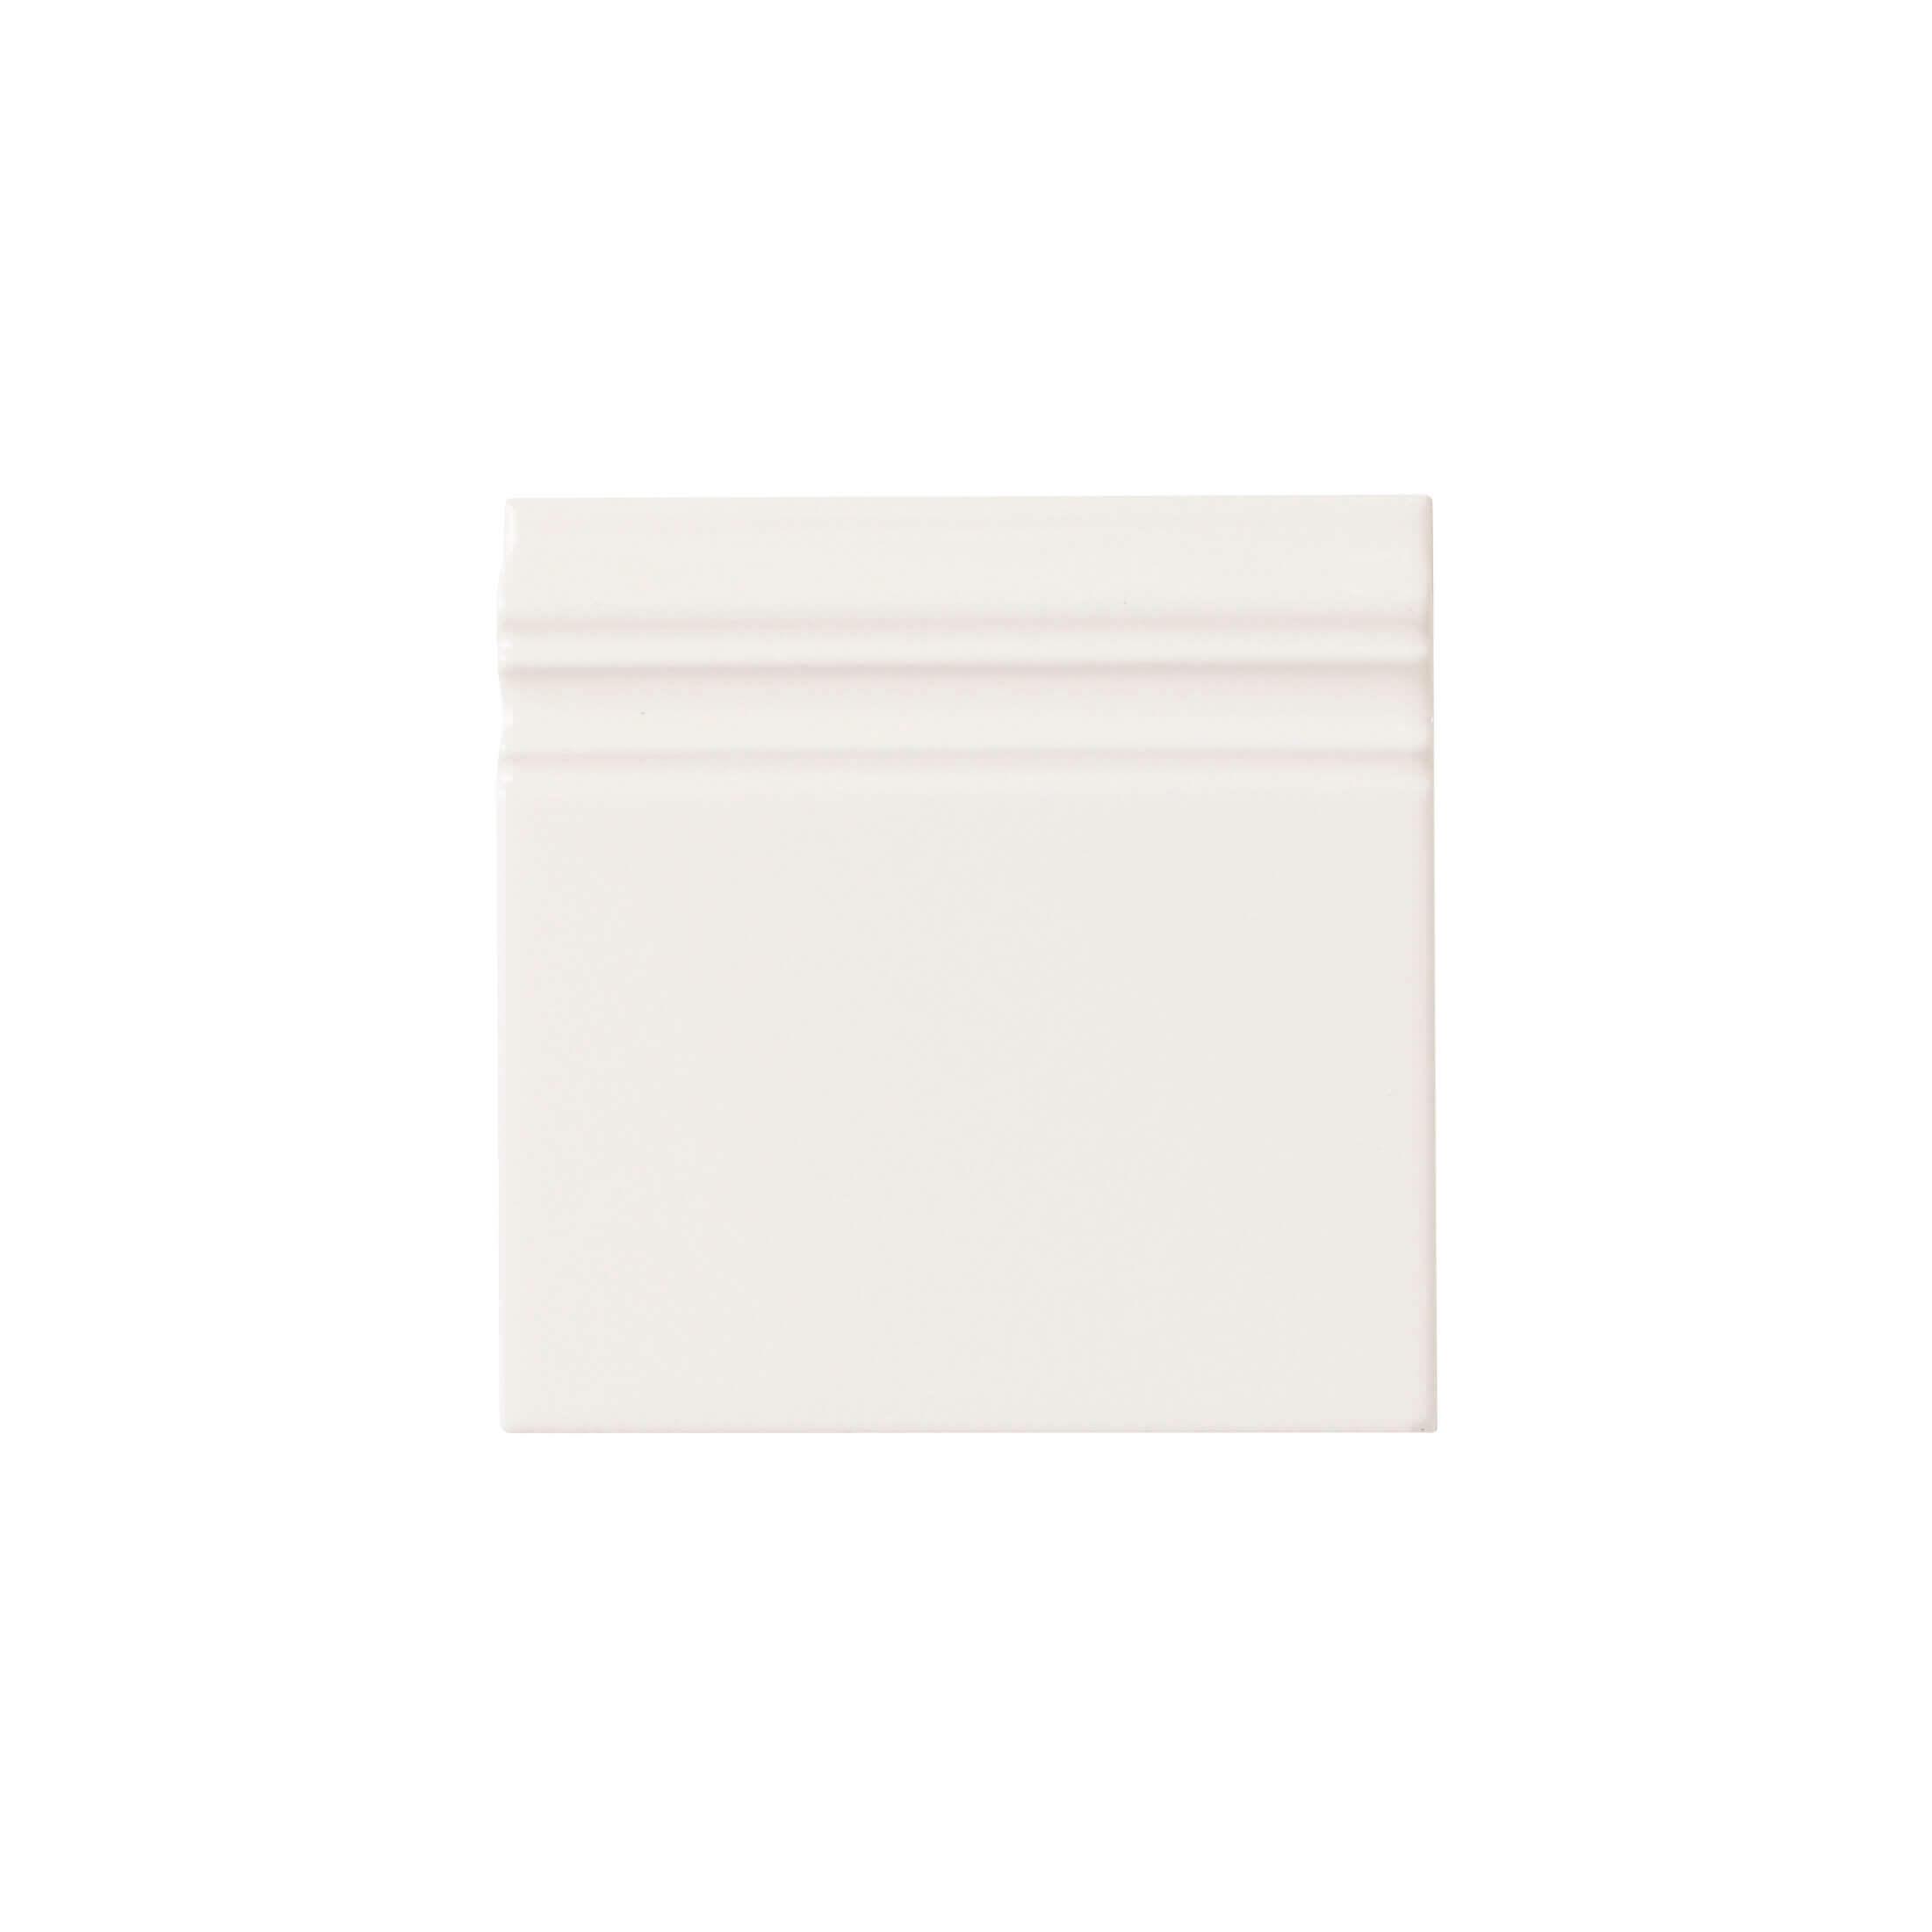 ADST5101 - RODAPIE  - 14.8 cm X 14.8 cm